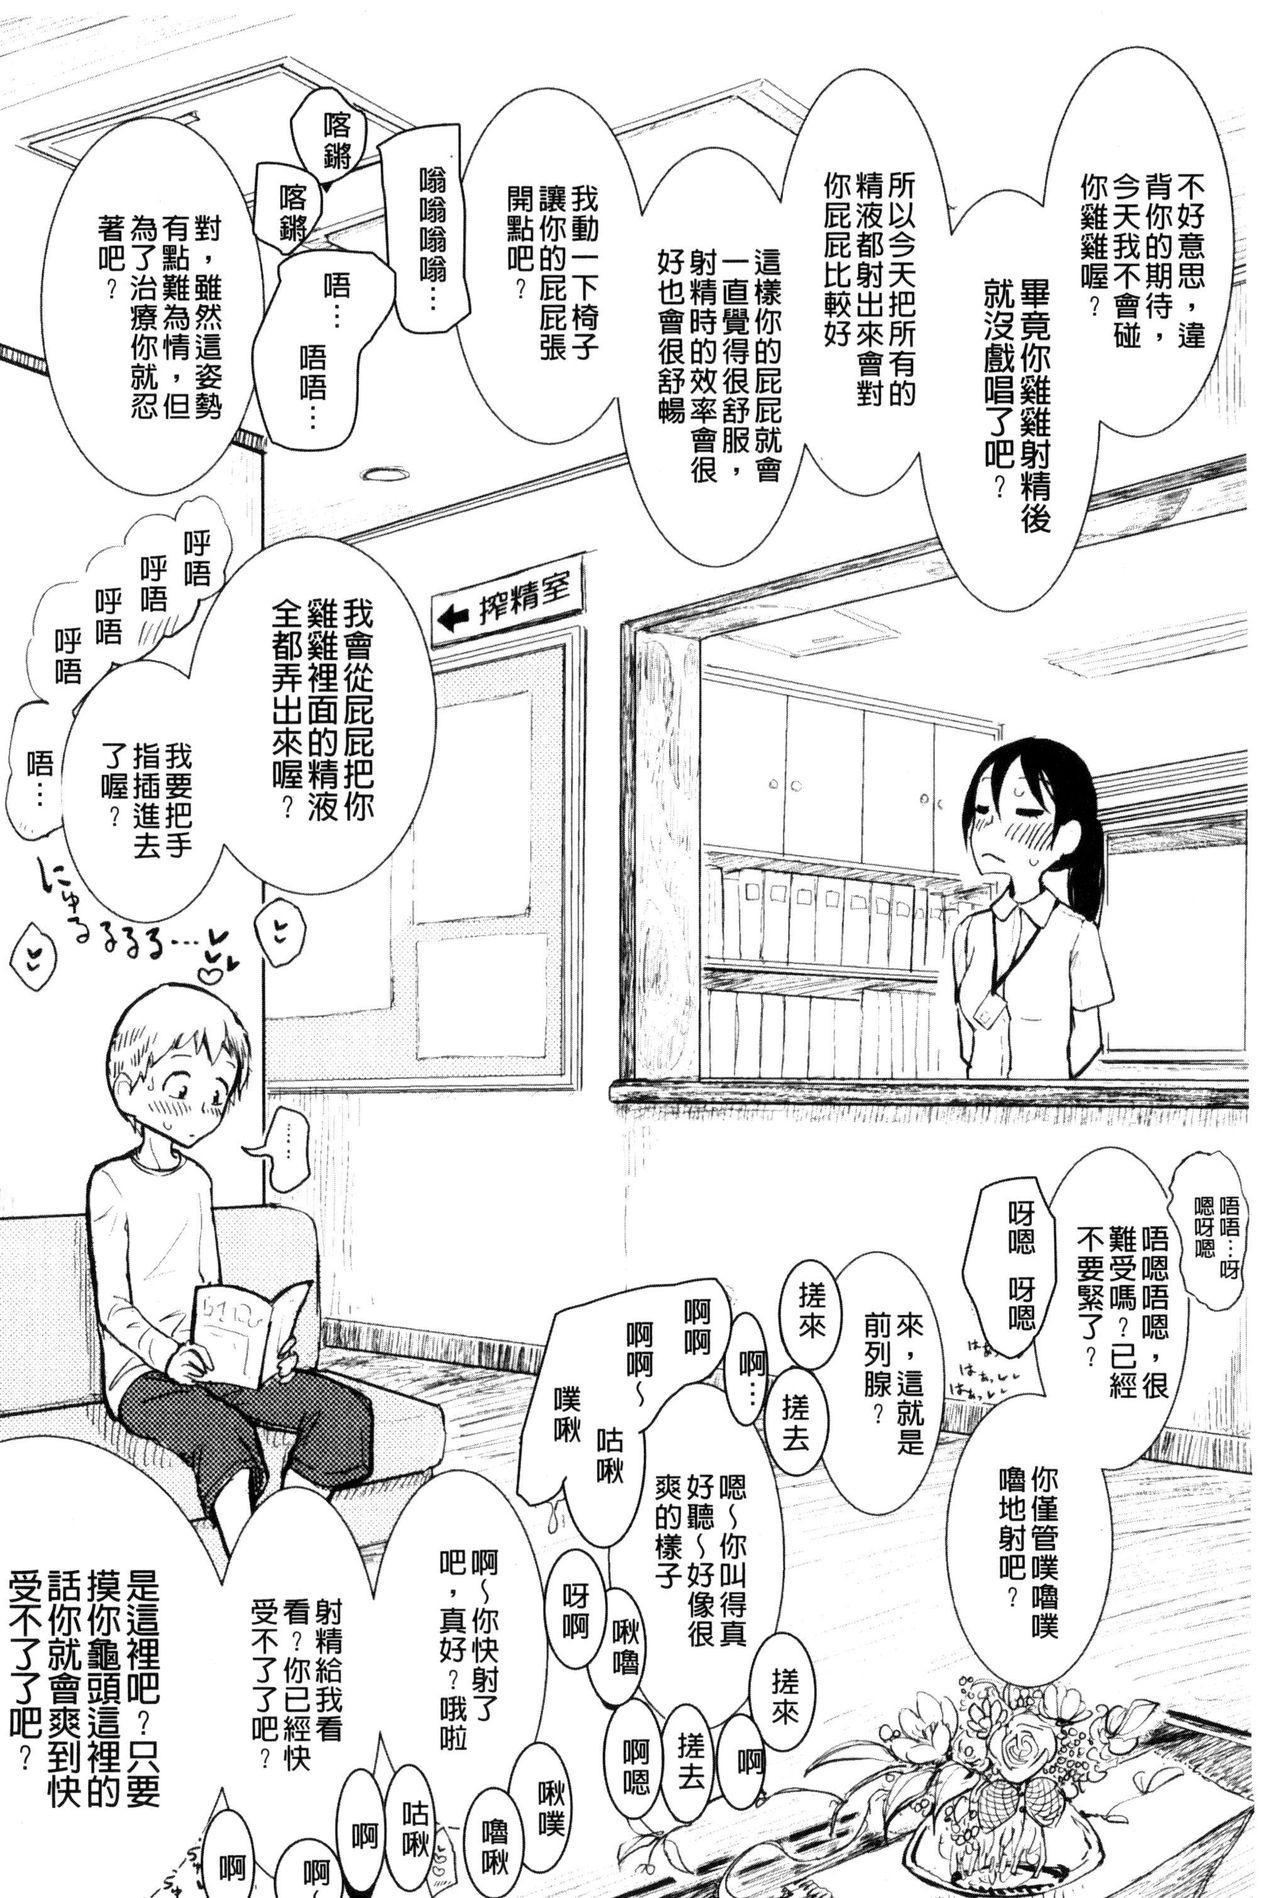 [Dhibi] Sono Yubisaki de Korogashite - Please Caress it at the Finger-tip. [Chinese] 181